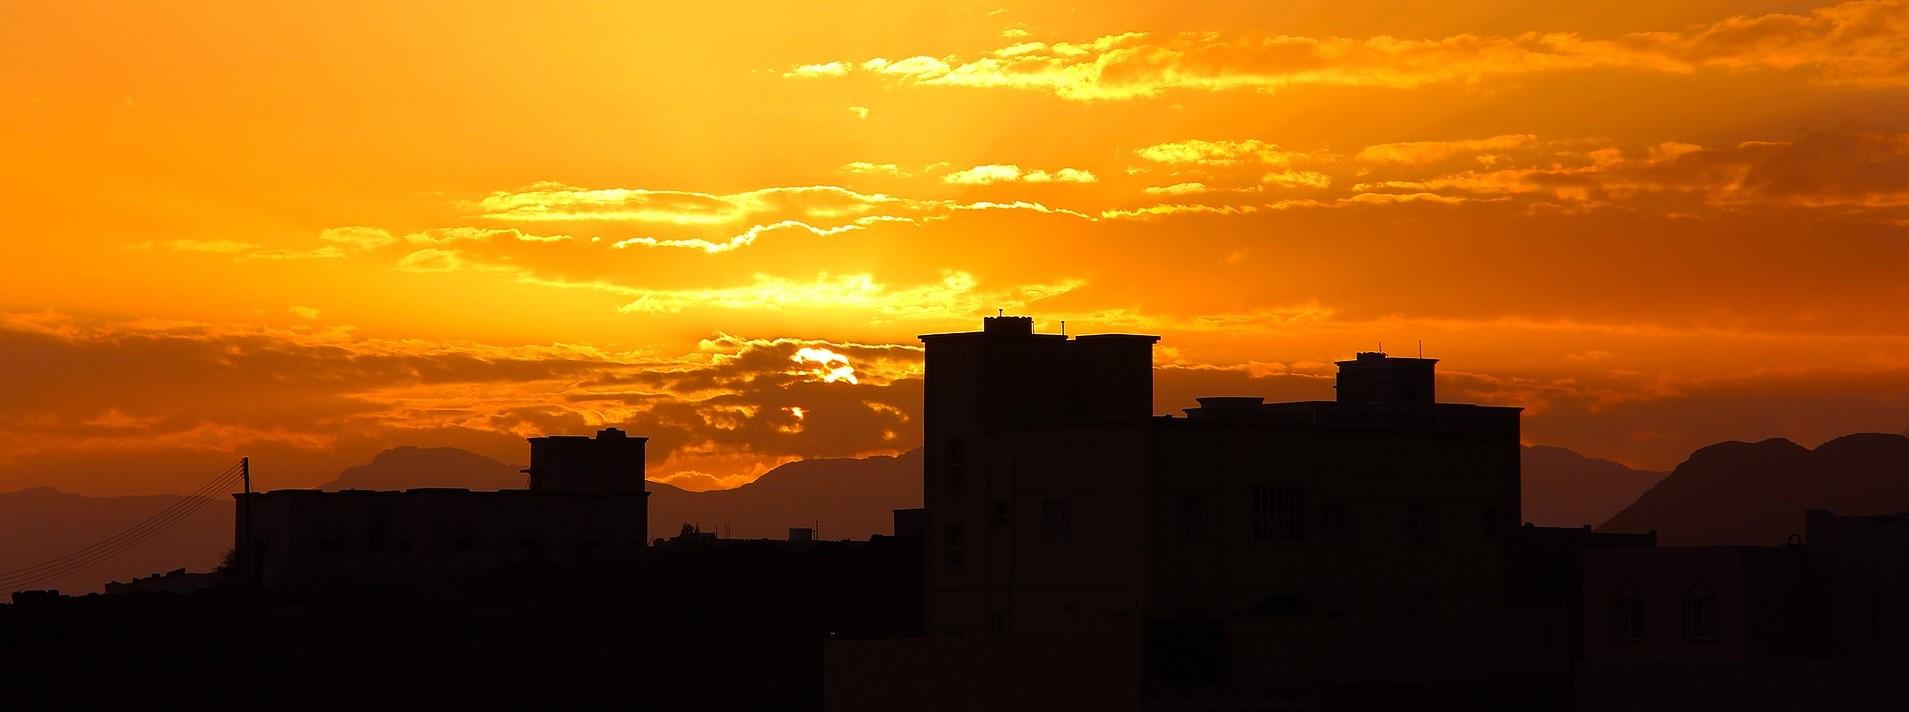 Magnificent Landscapes of Oman